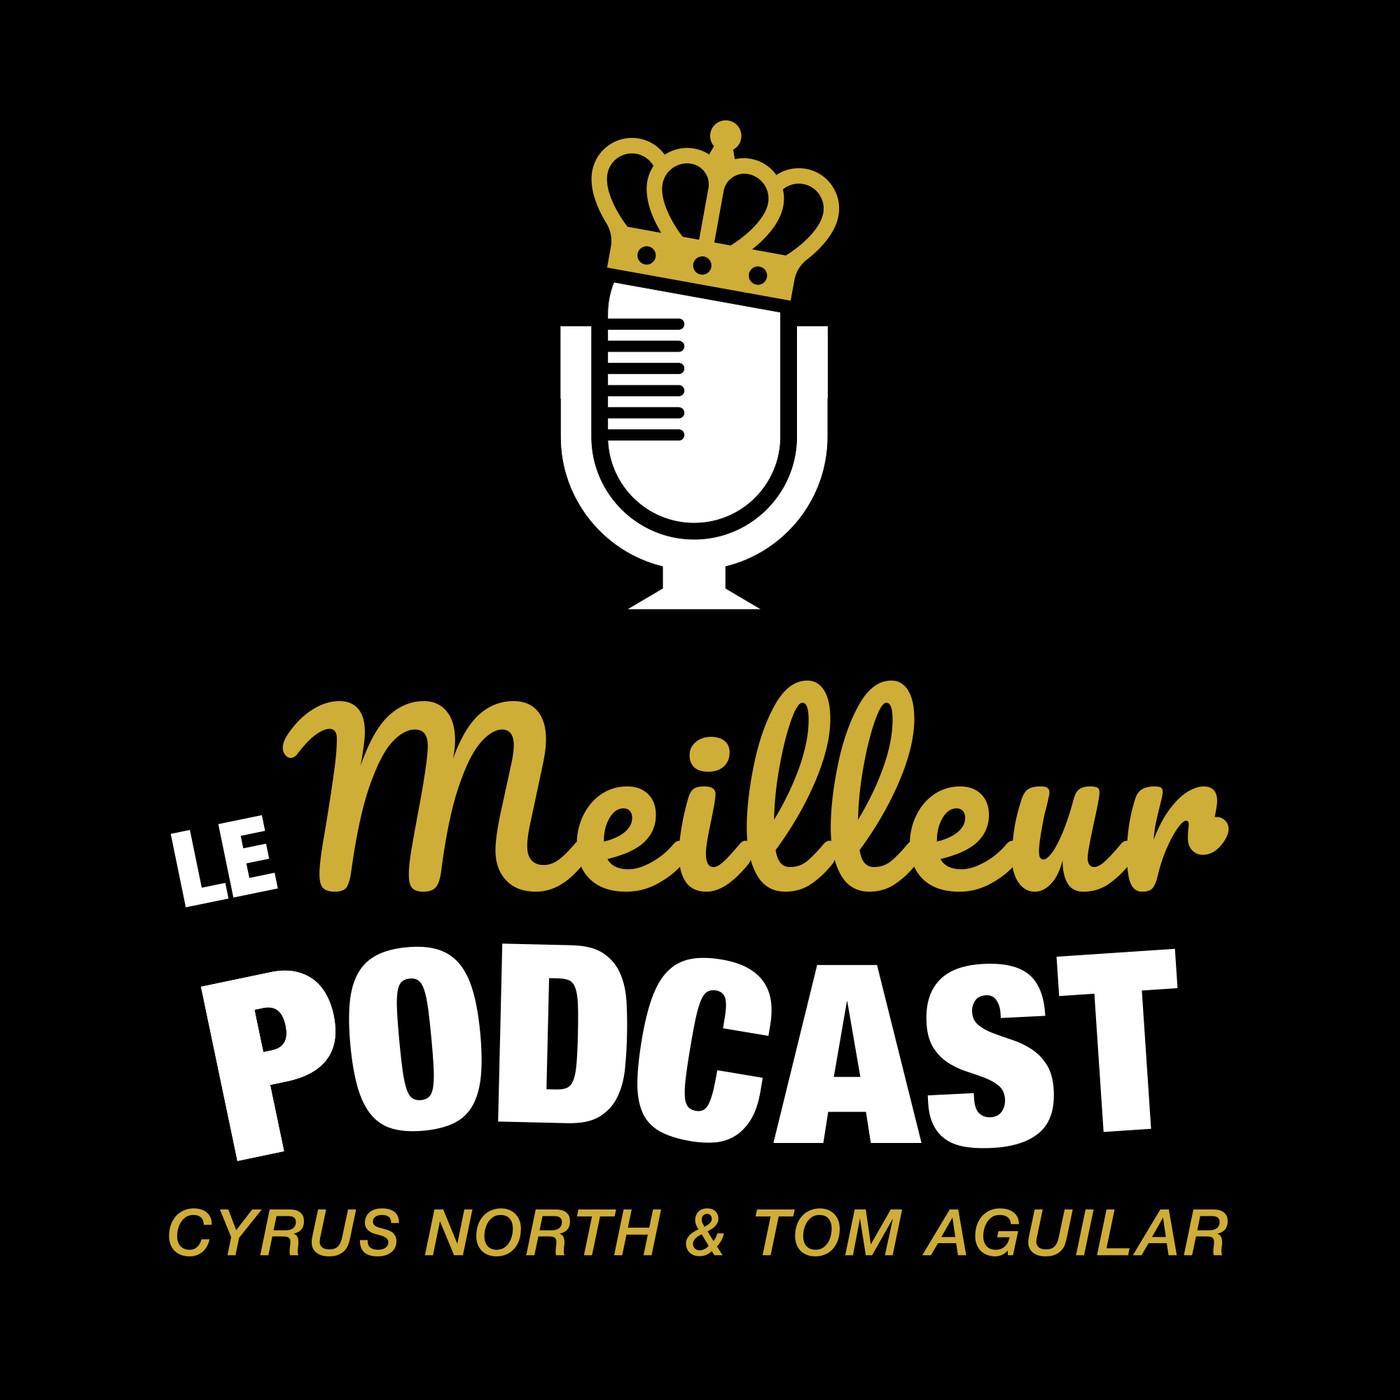 le-meilleur-podcast-culturclub.jpeg